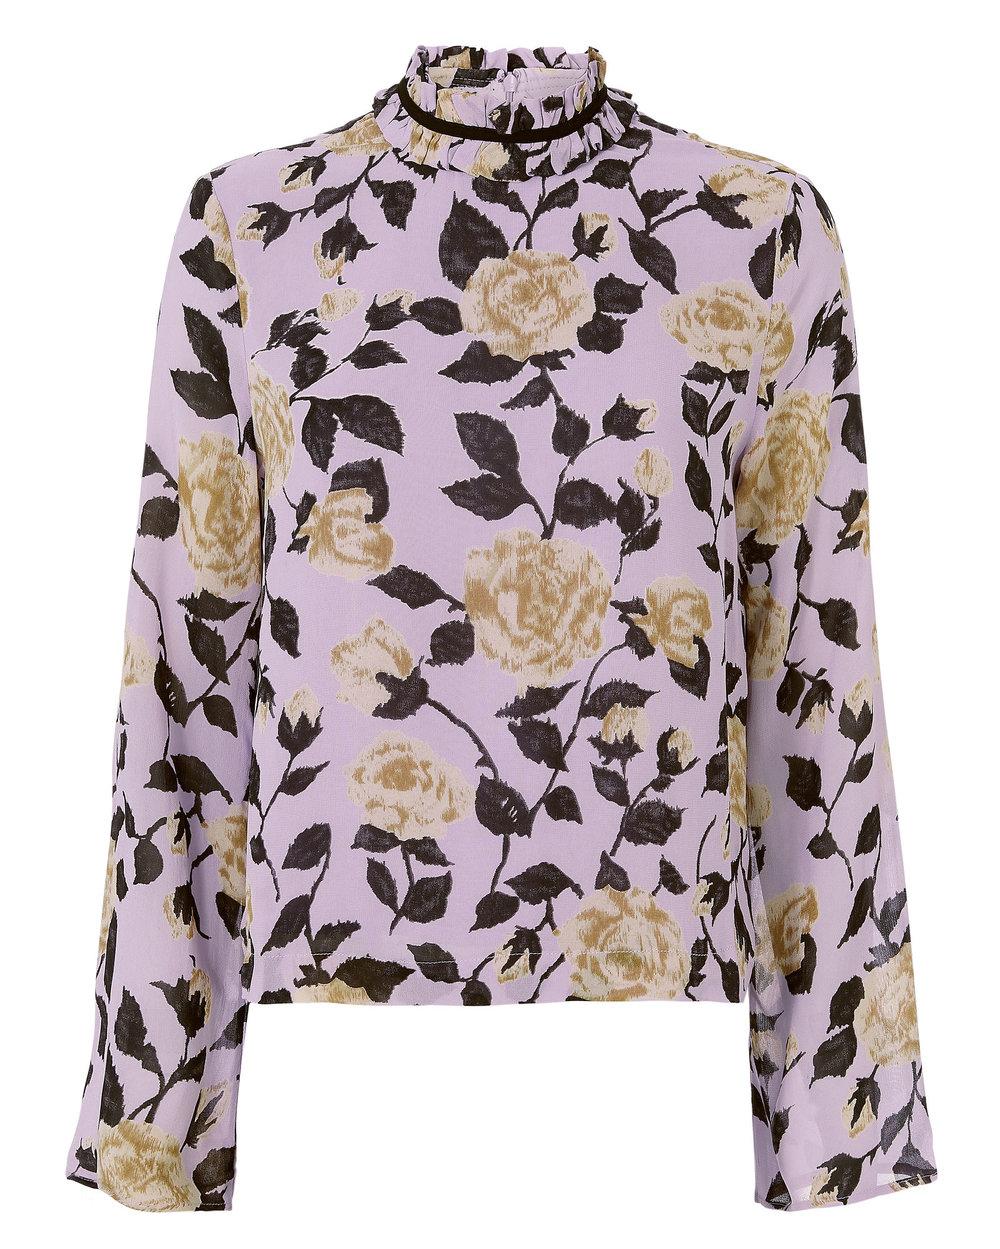 lavender + black floral blouse